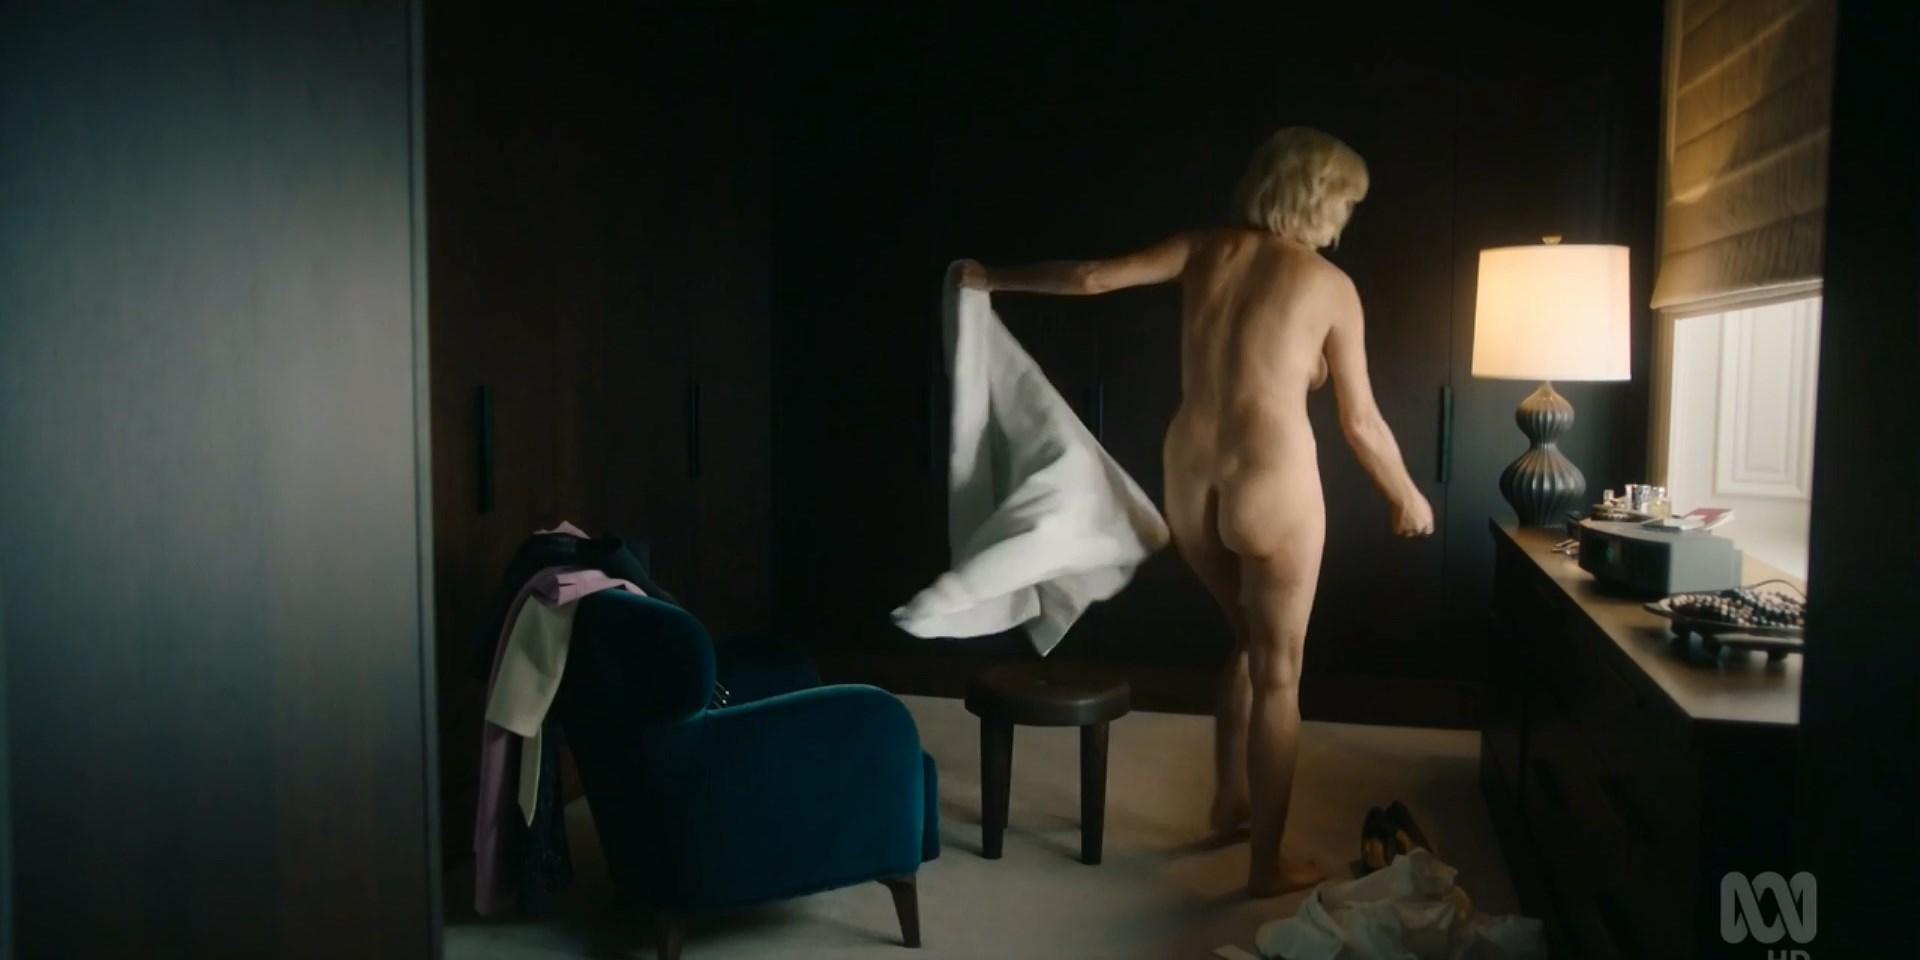 Rachel griffiths nude videos